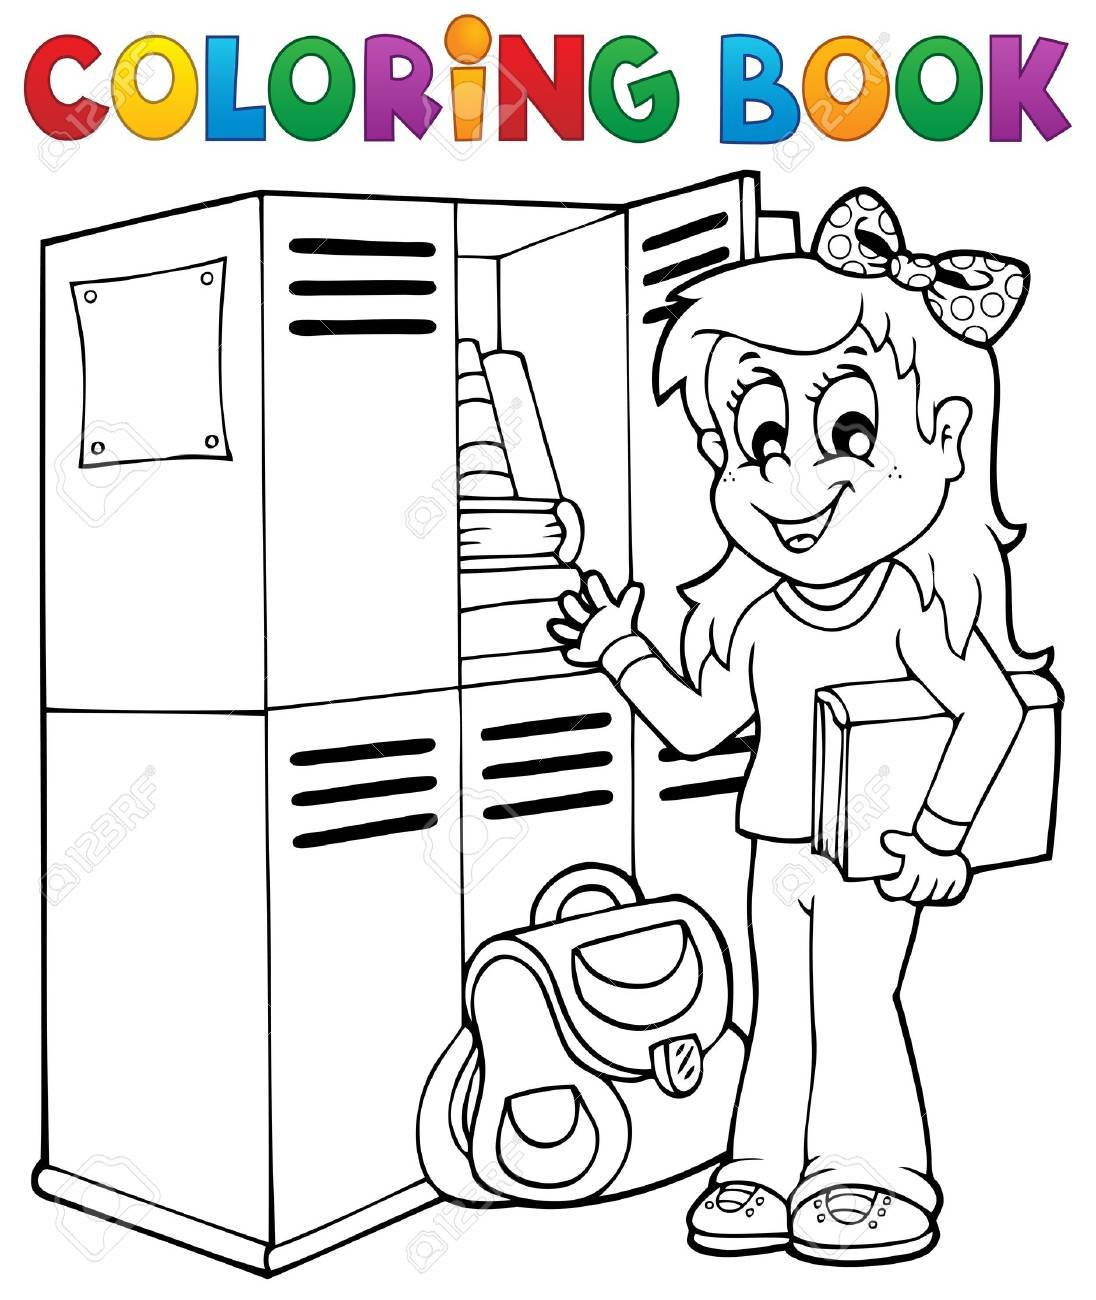 Coloring book school topic 5 - eps10 vector illustration Stock Vector - 21571124